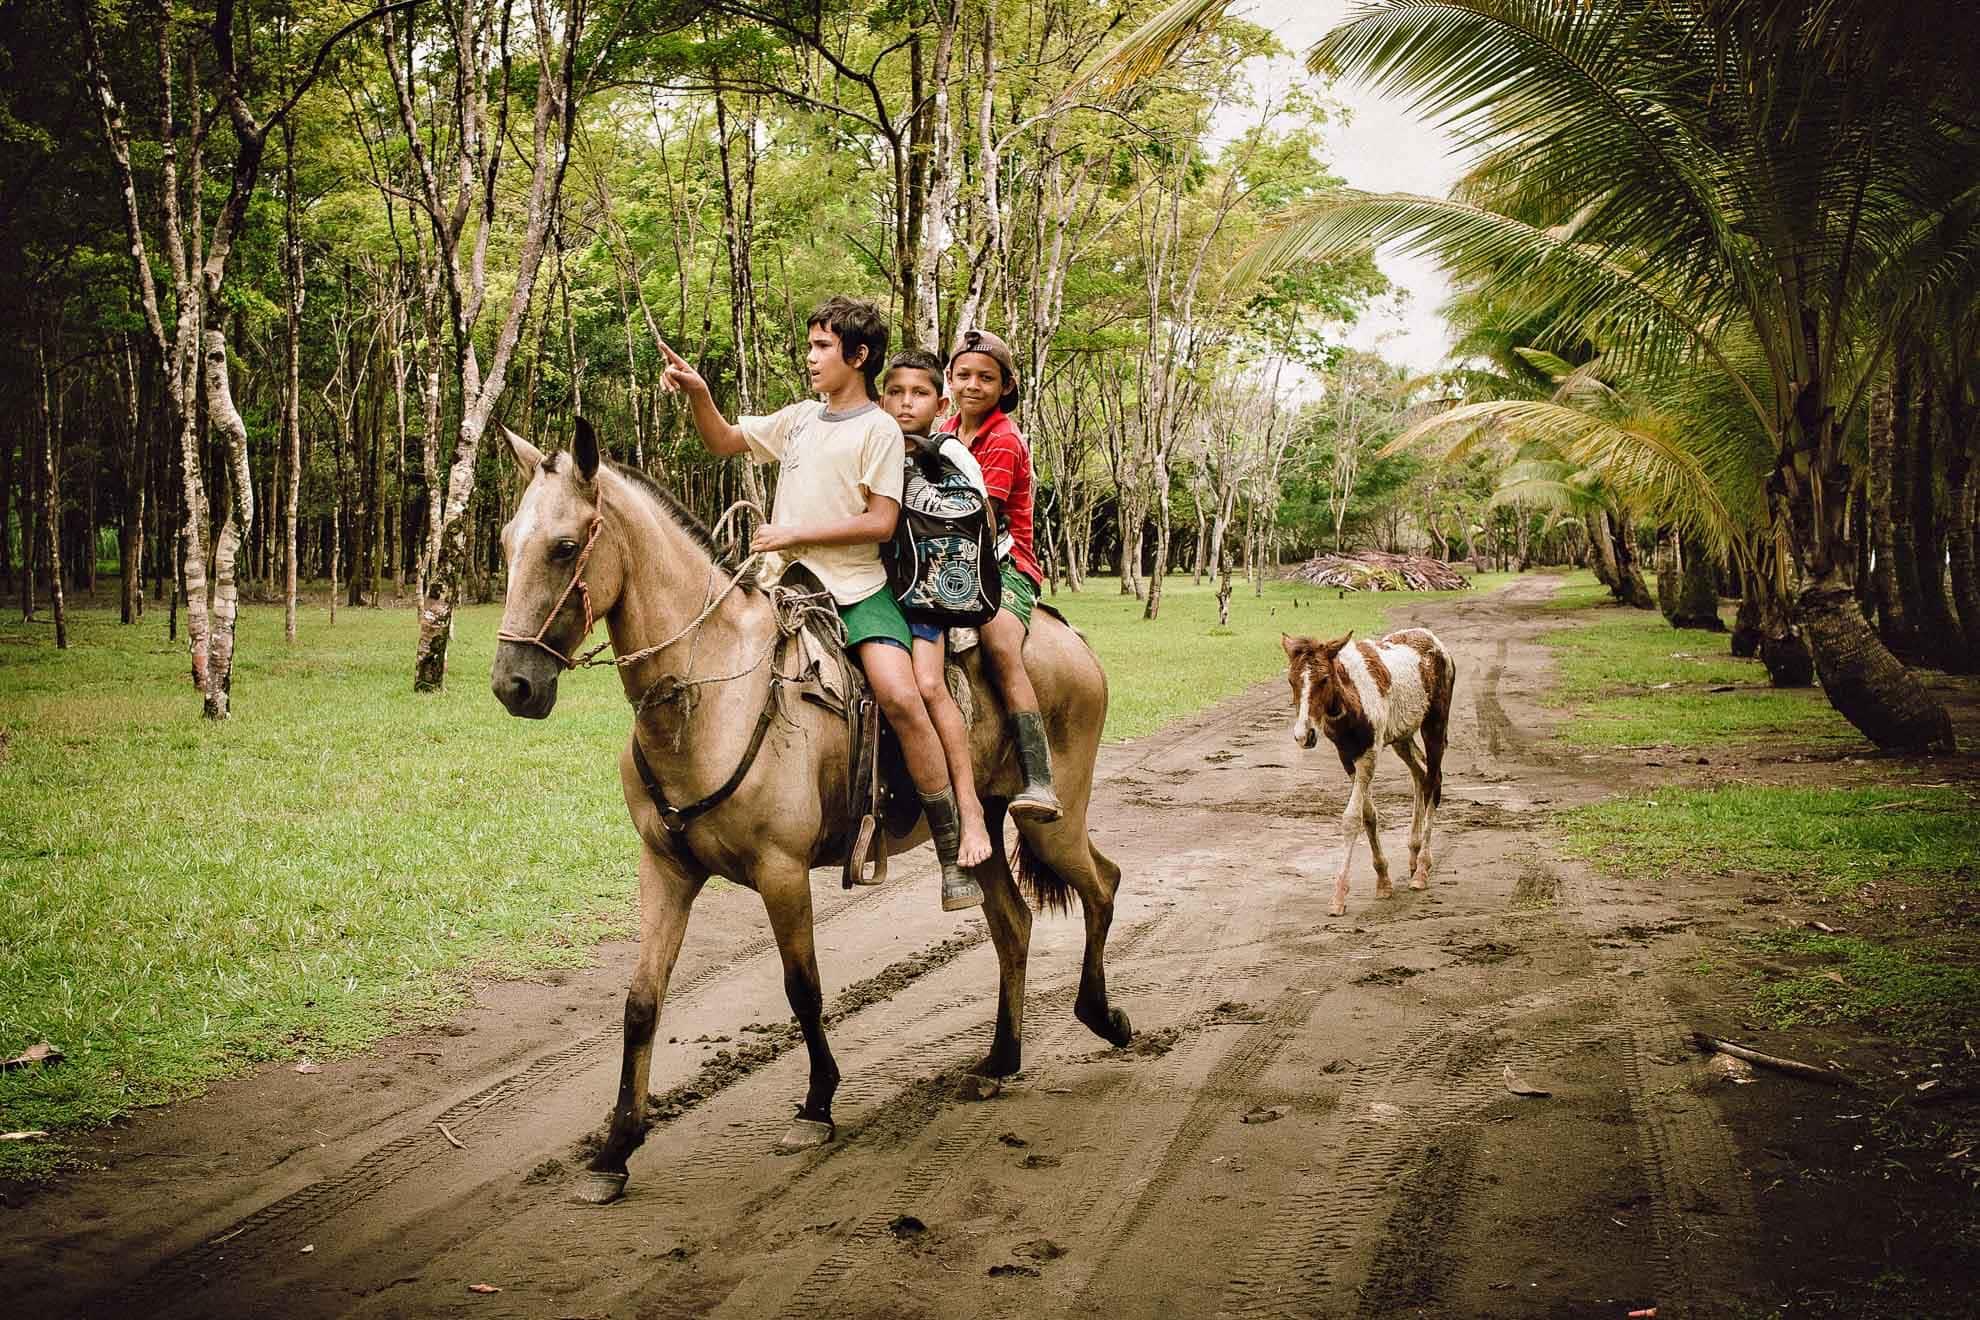 Horses on Kids at Playa Linda, Costa Rica